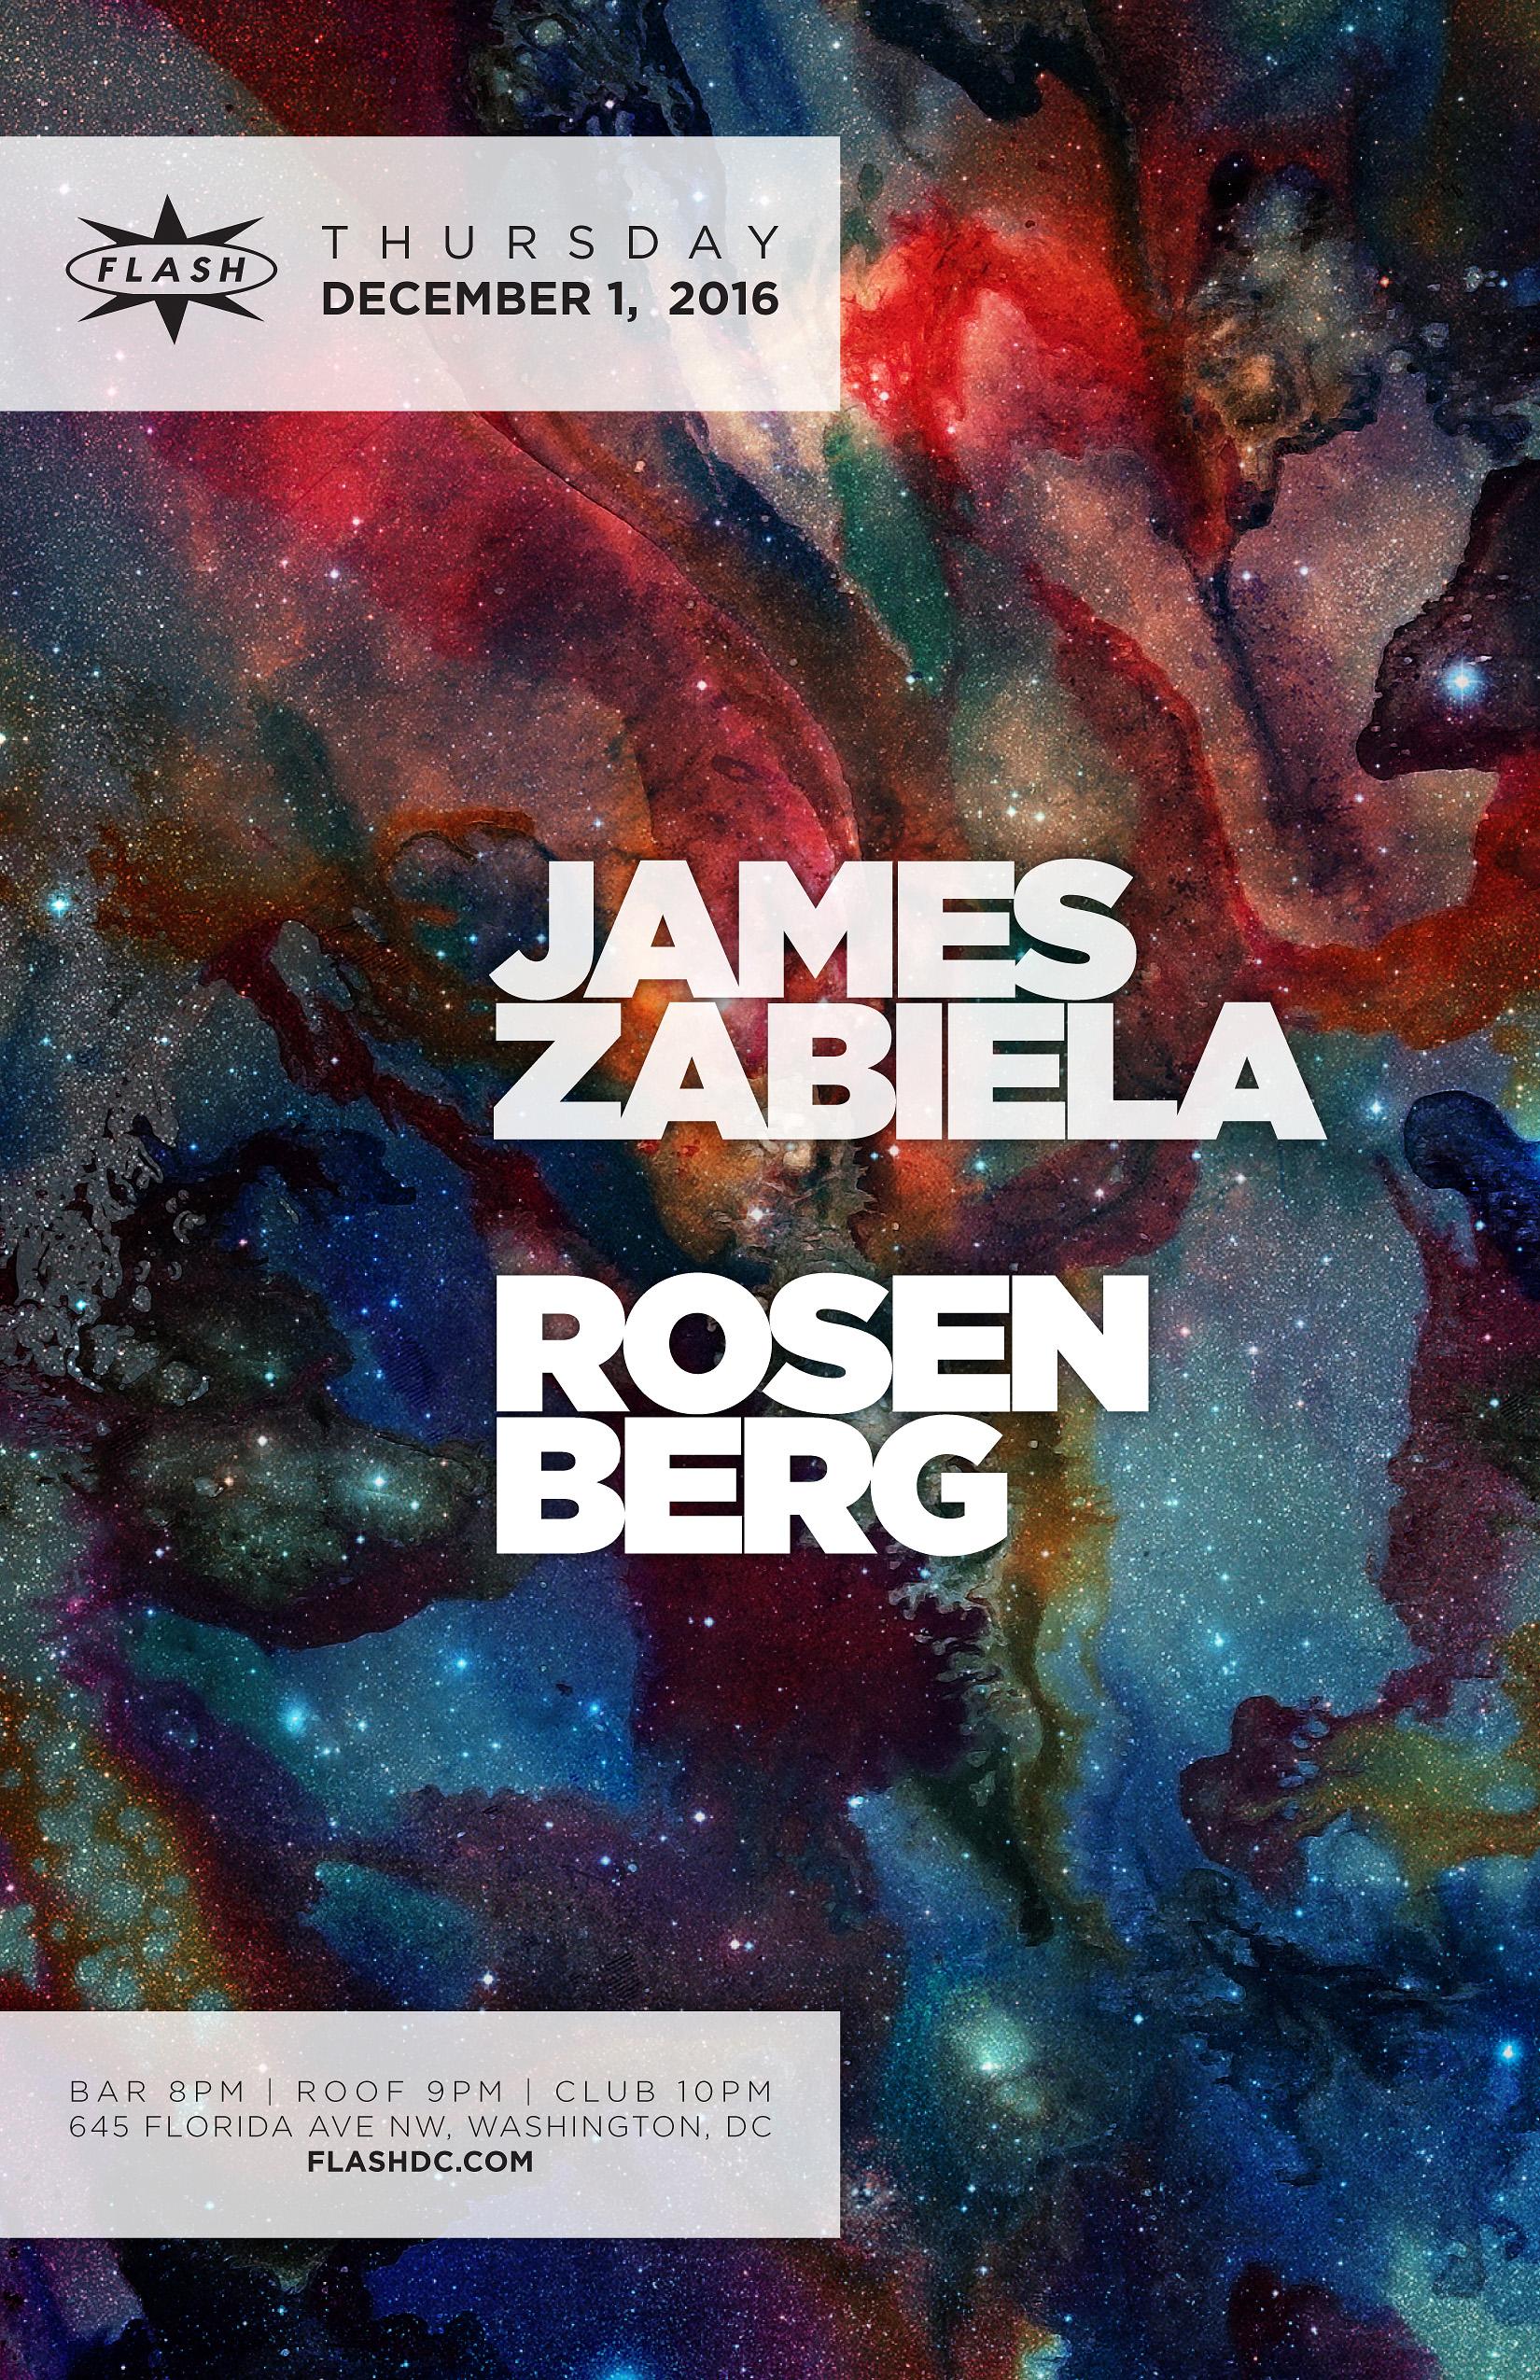 James Zabiela event thumbnail